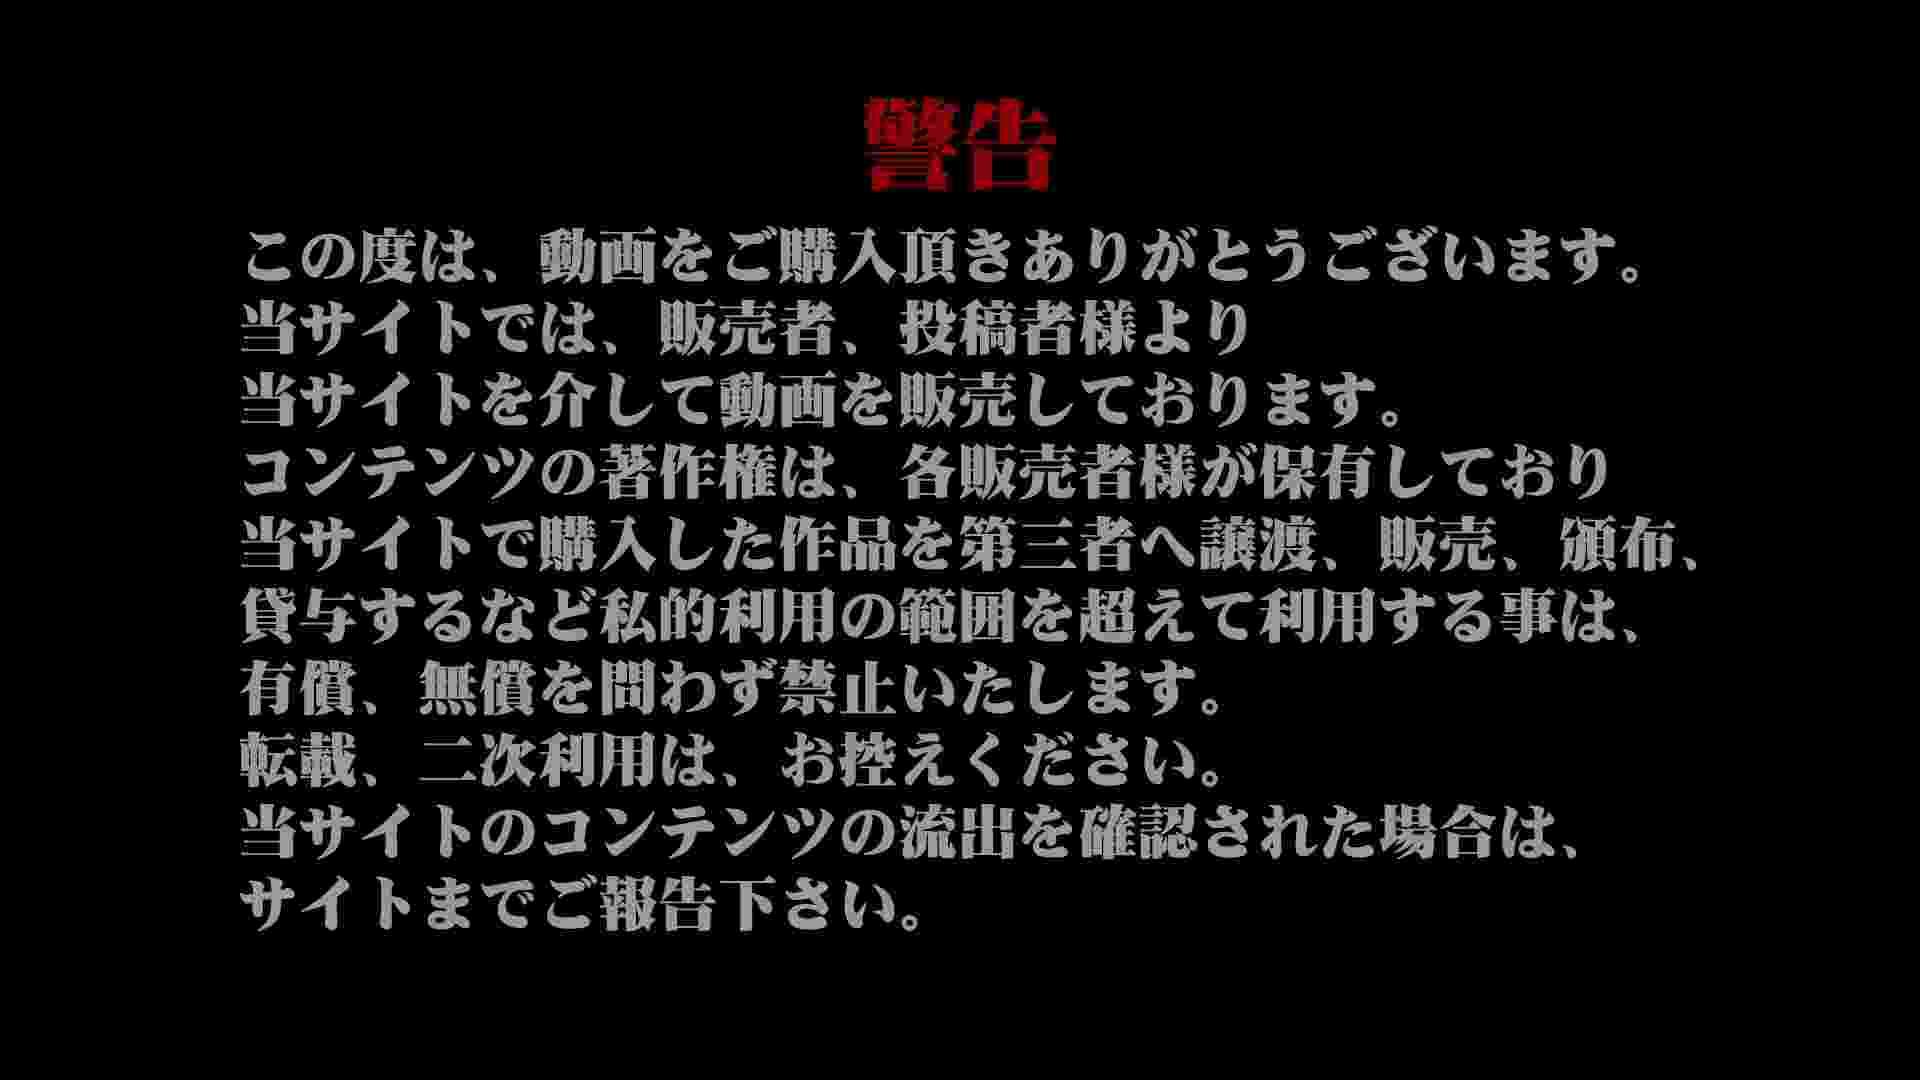 Aquaな露天風呂Vol.951 露天   盗撮特撮  10pic 1